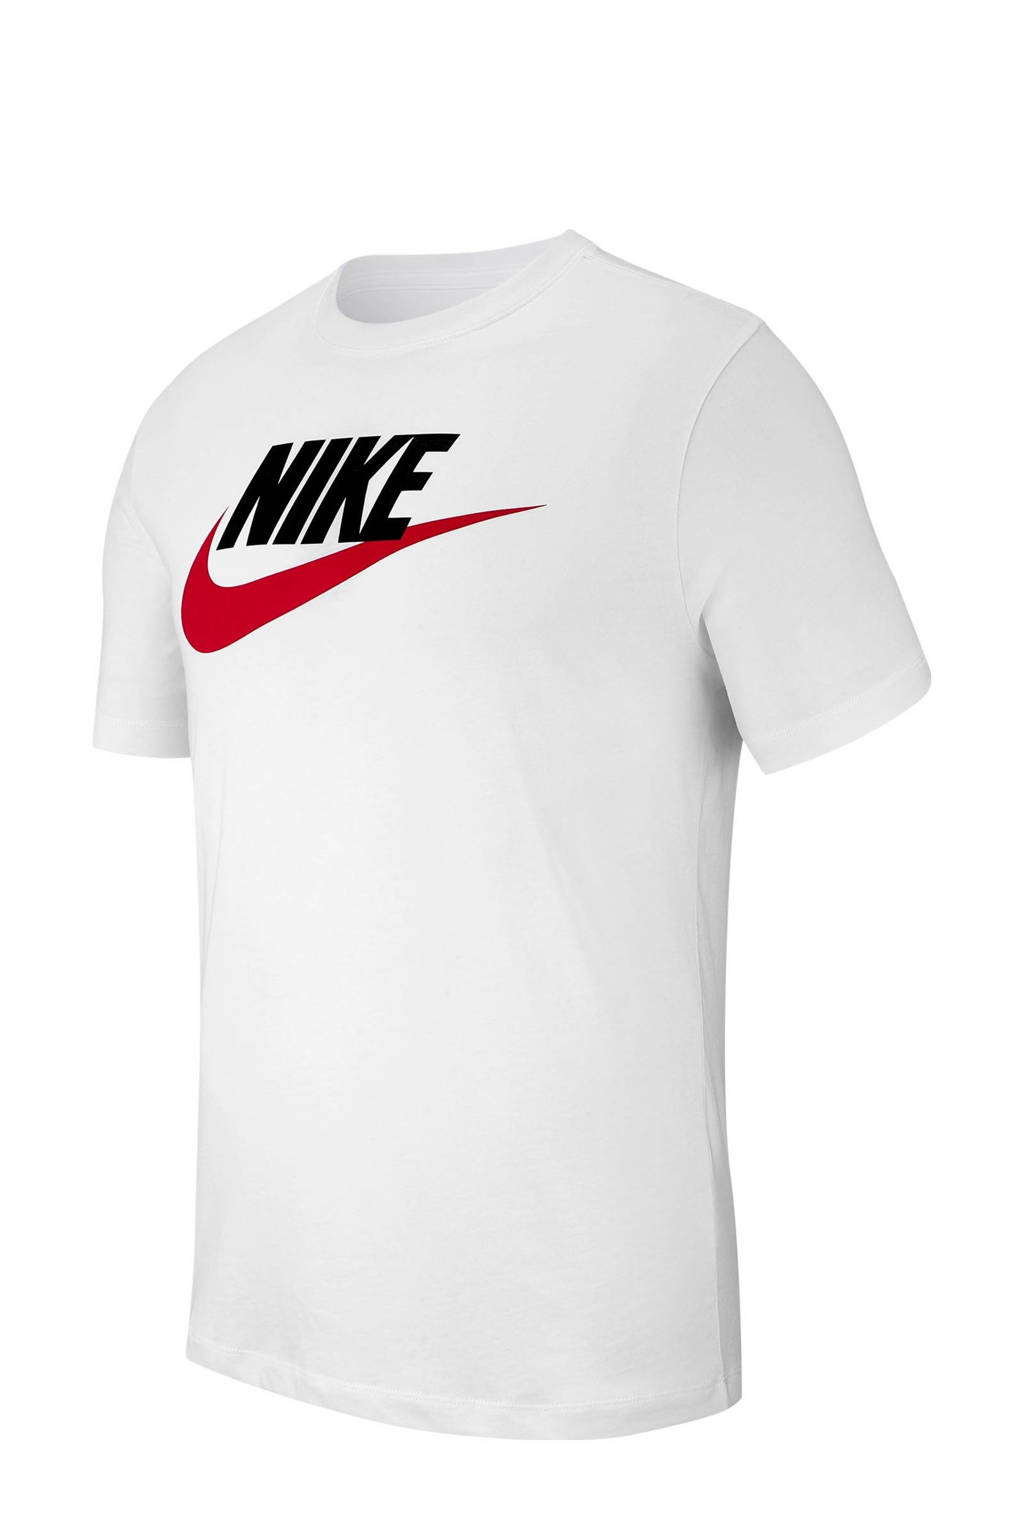 Nike T-shirt, Wit/zwart/rood